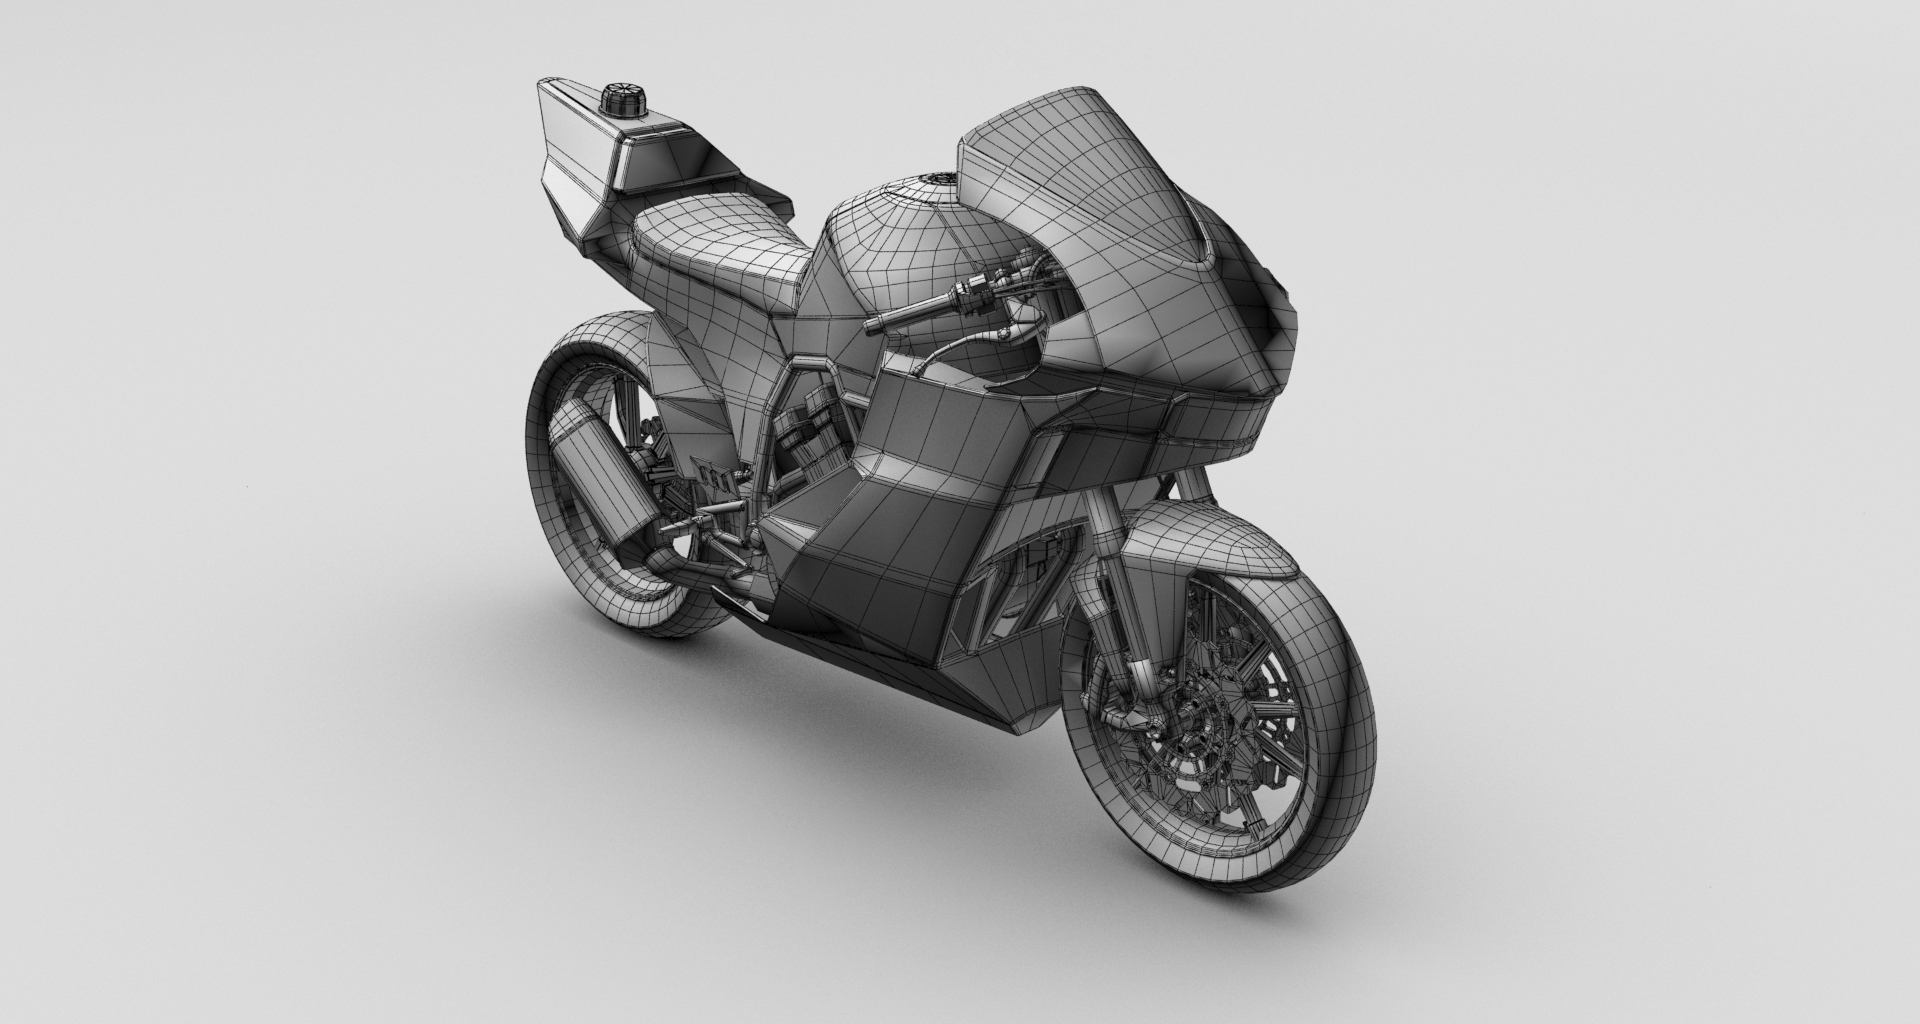 2016_MotoRacer4_F.Beudin_MotoPolice-AO-Front